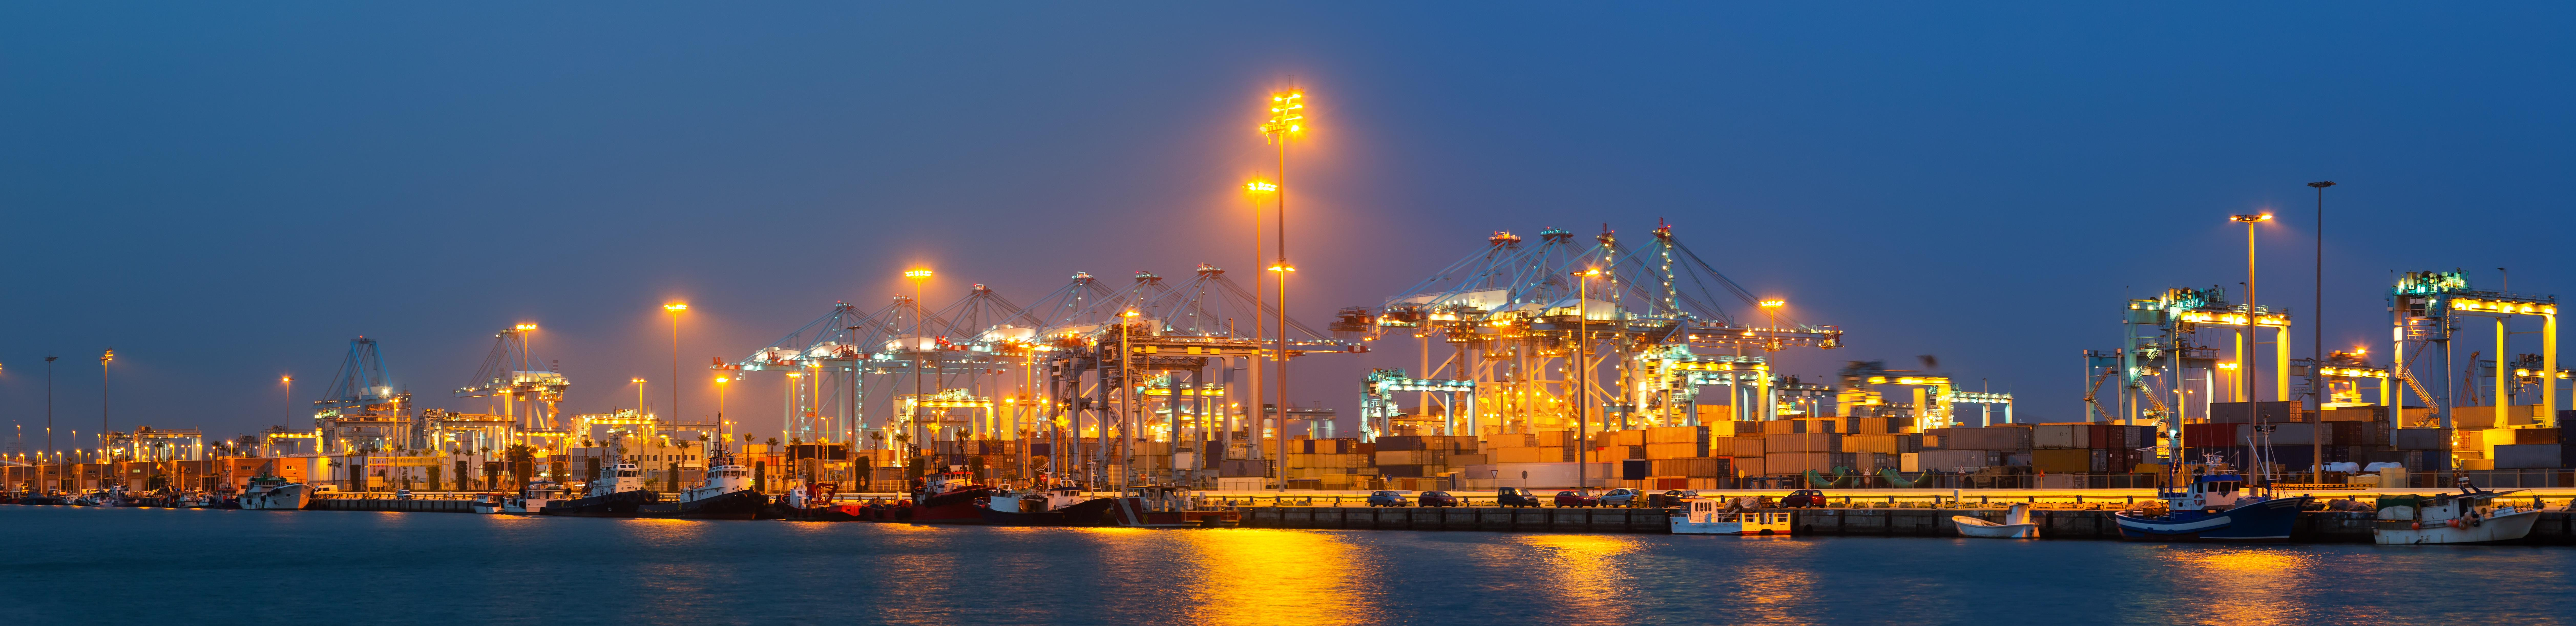 night panorama of  seaport